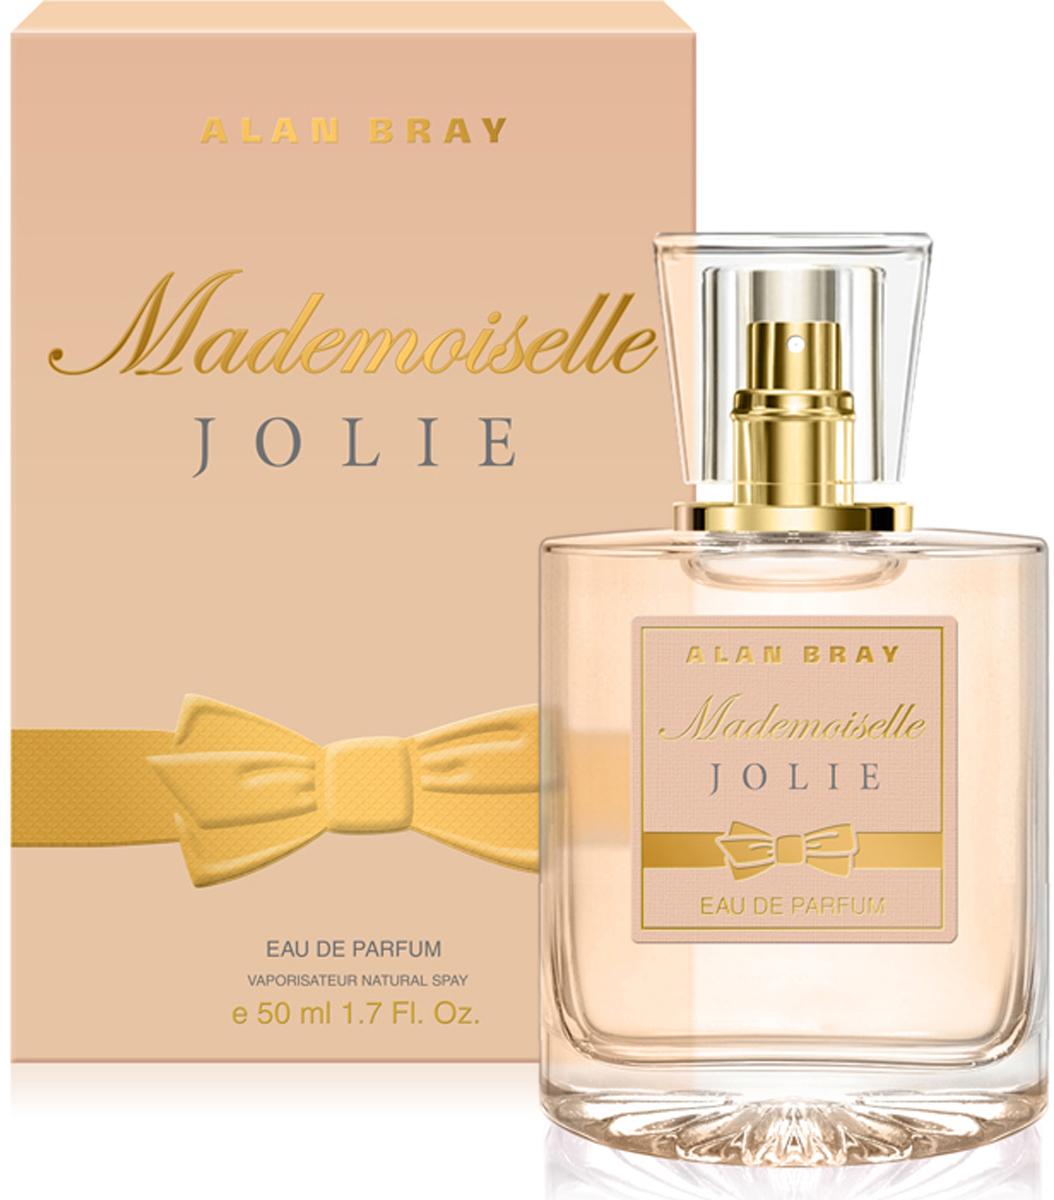 Alan Bray Парфюмерная вода Mademoiselle Jolie, 50 мл alan bray paris je t aime desir парфюмированная вода 50 мл